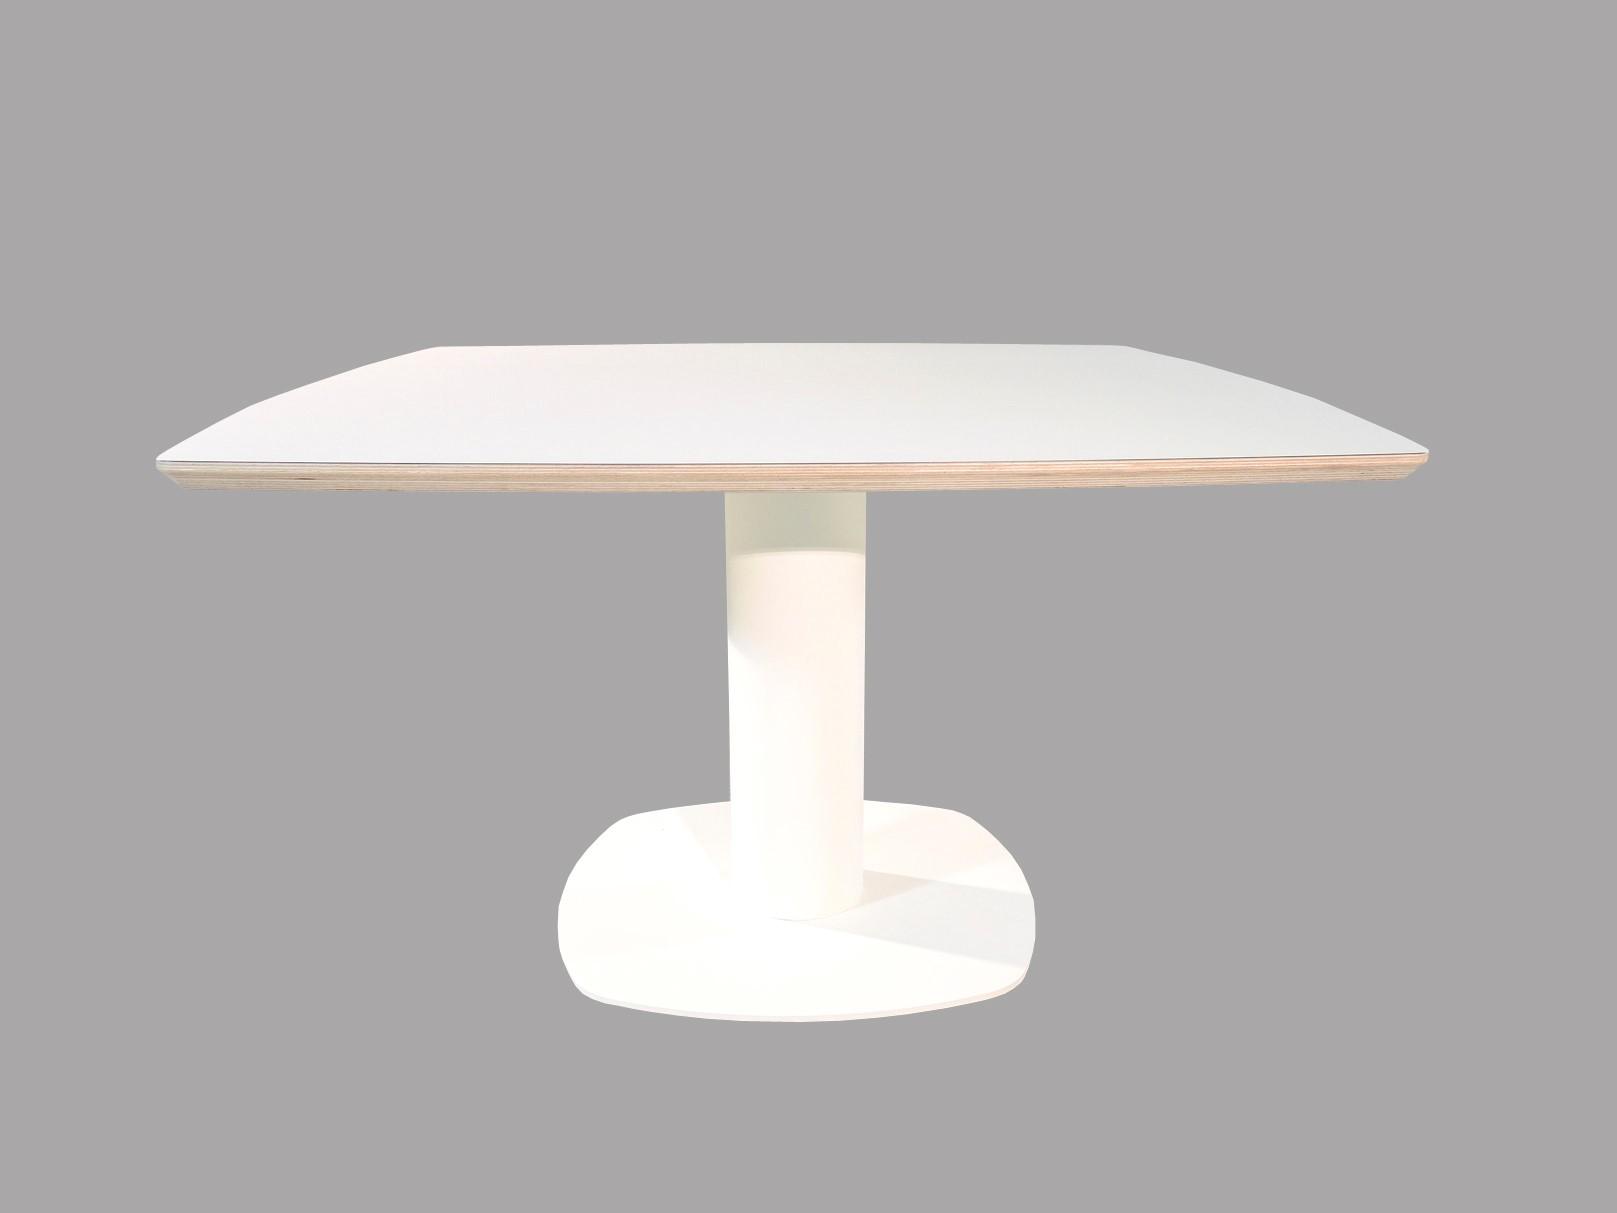 Eettafel Wit Vierkant.Empoli Fenix Design Eettafel